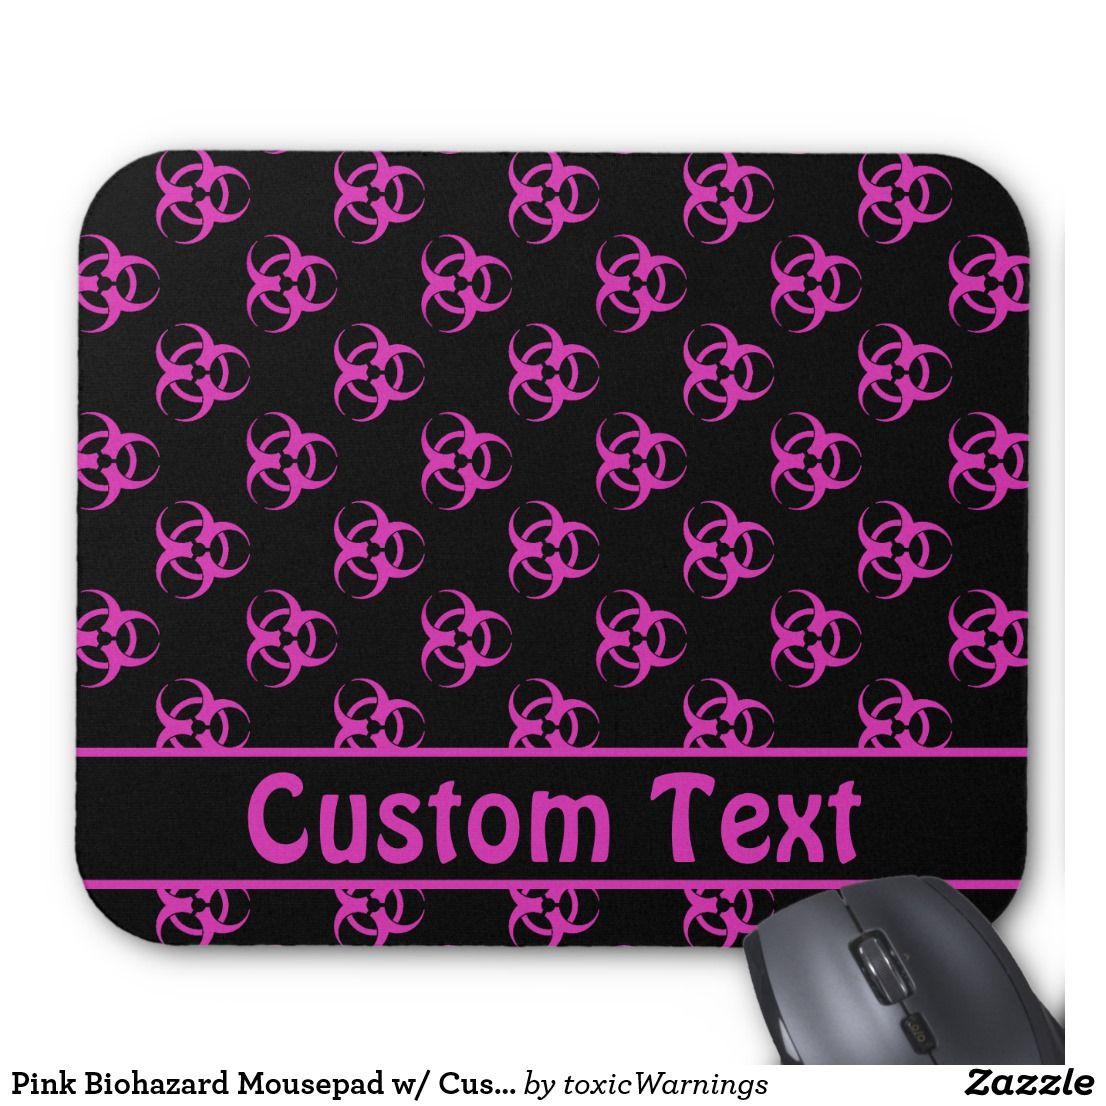 Pink Biohazard Mousepad w/ Custom Text